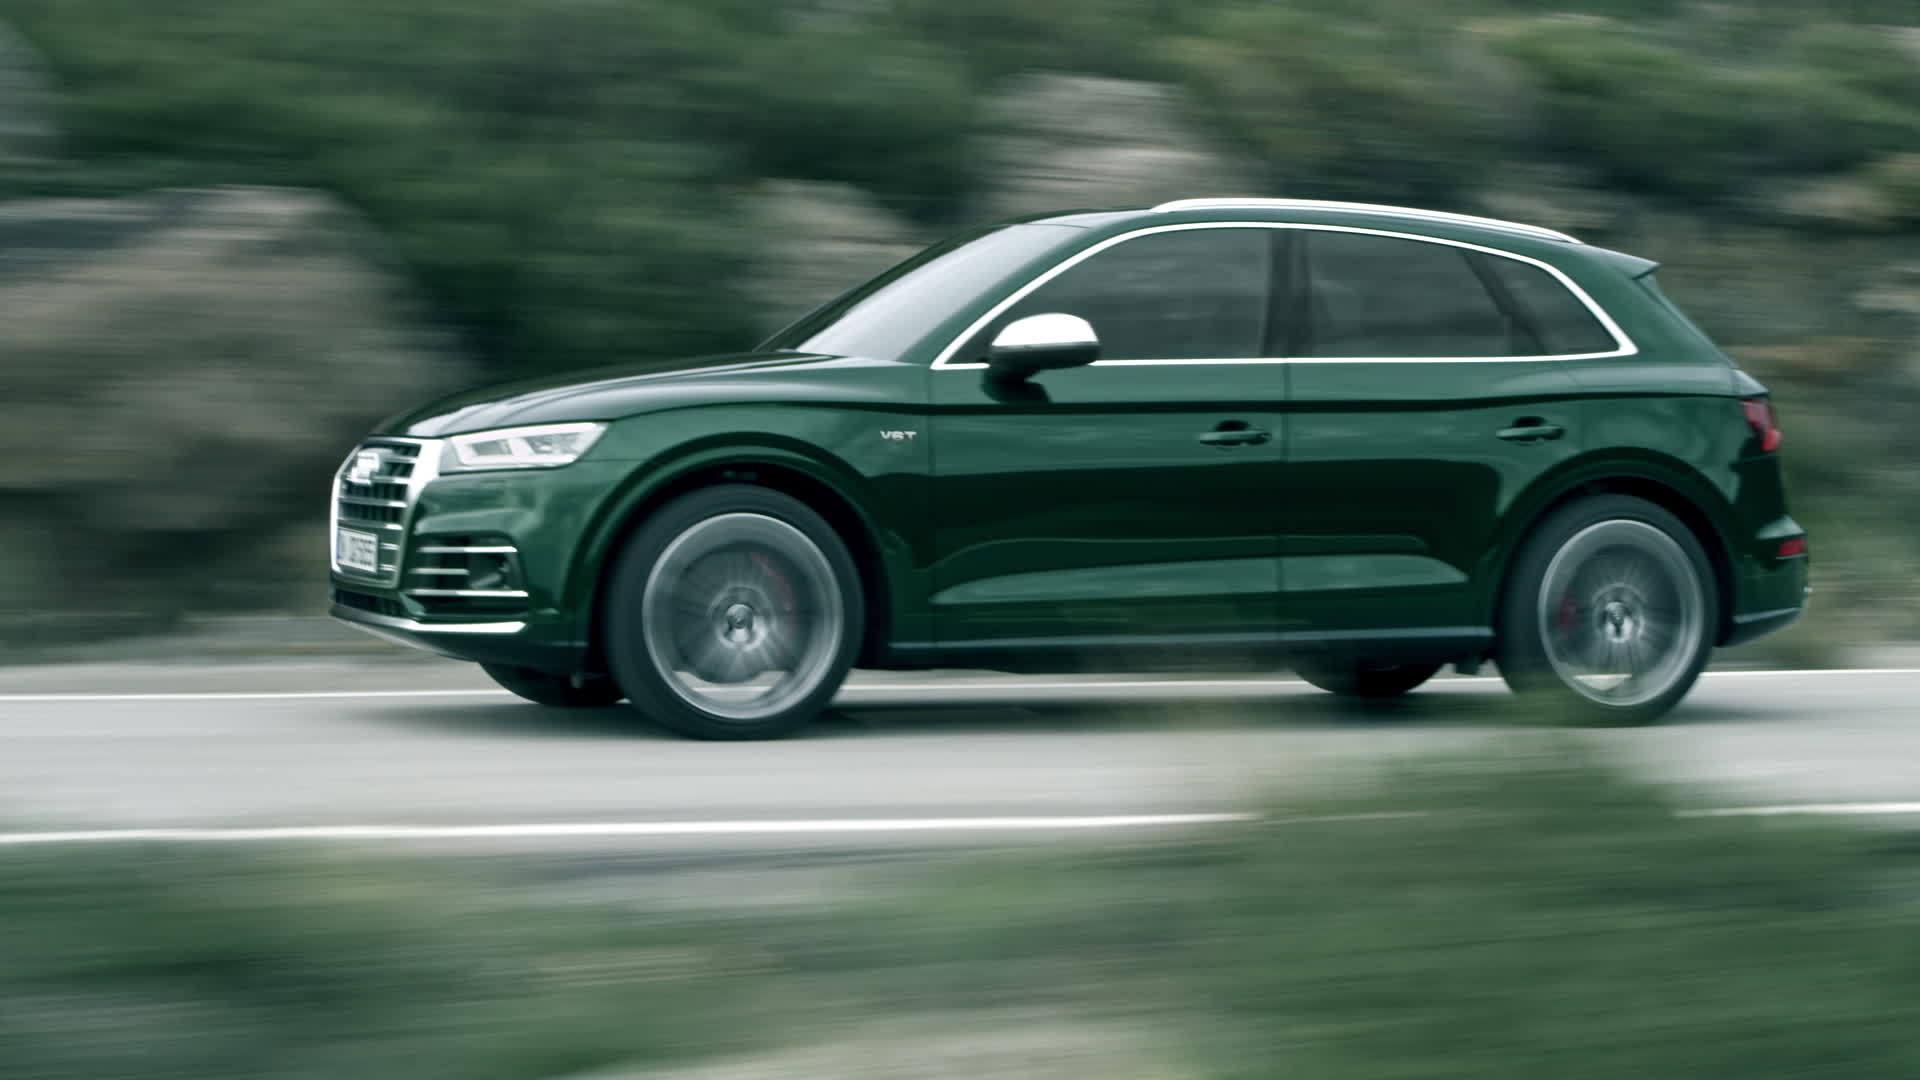 Audi SQ5 - The pinnacle of the Q5 model series